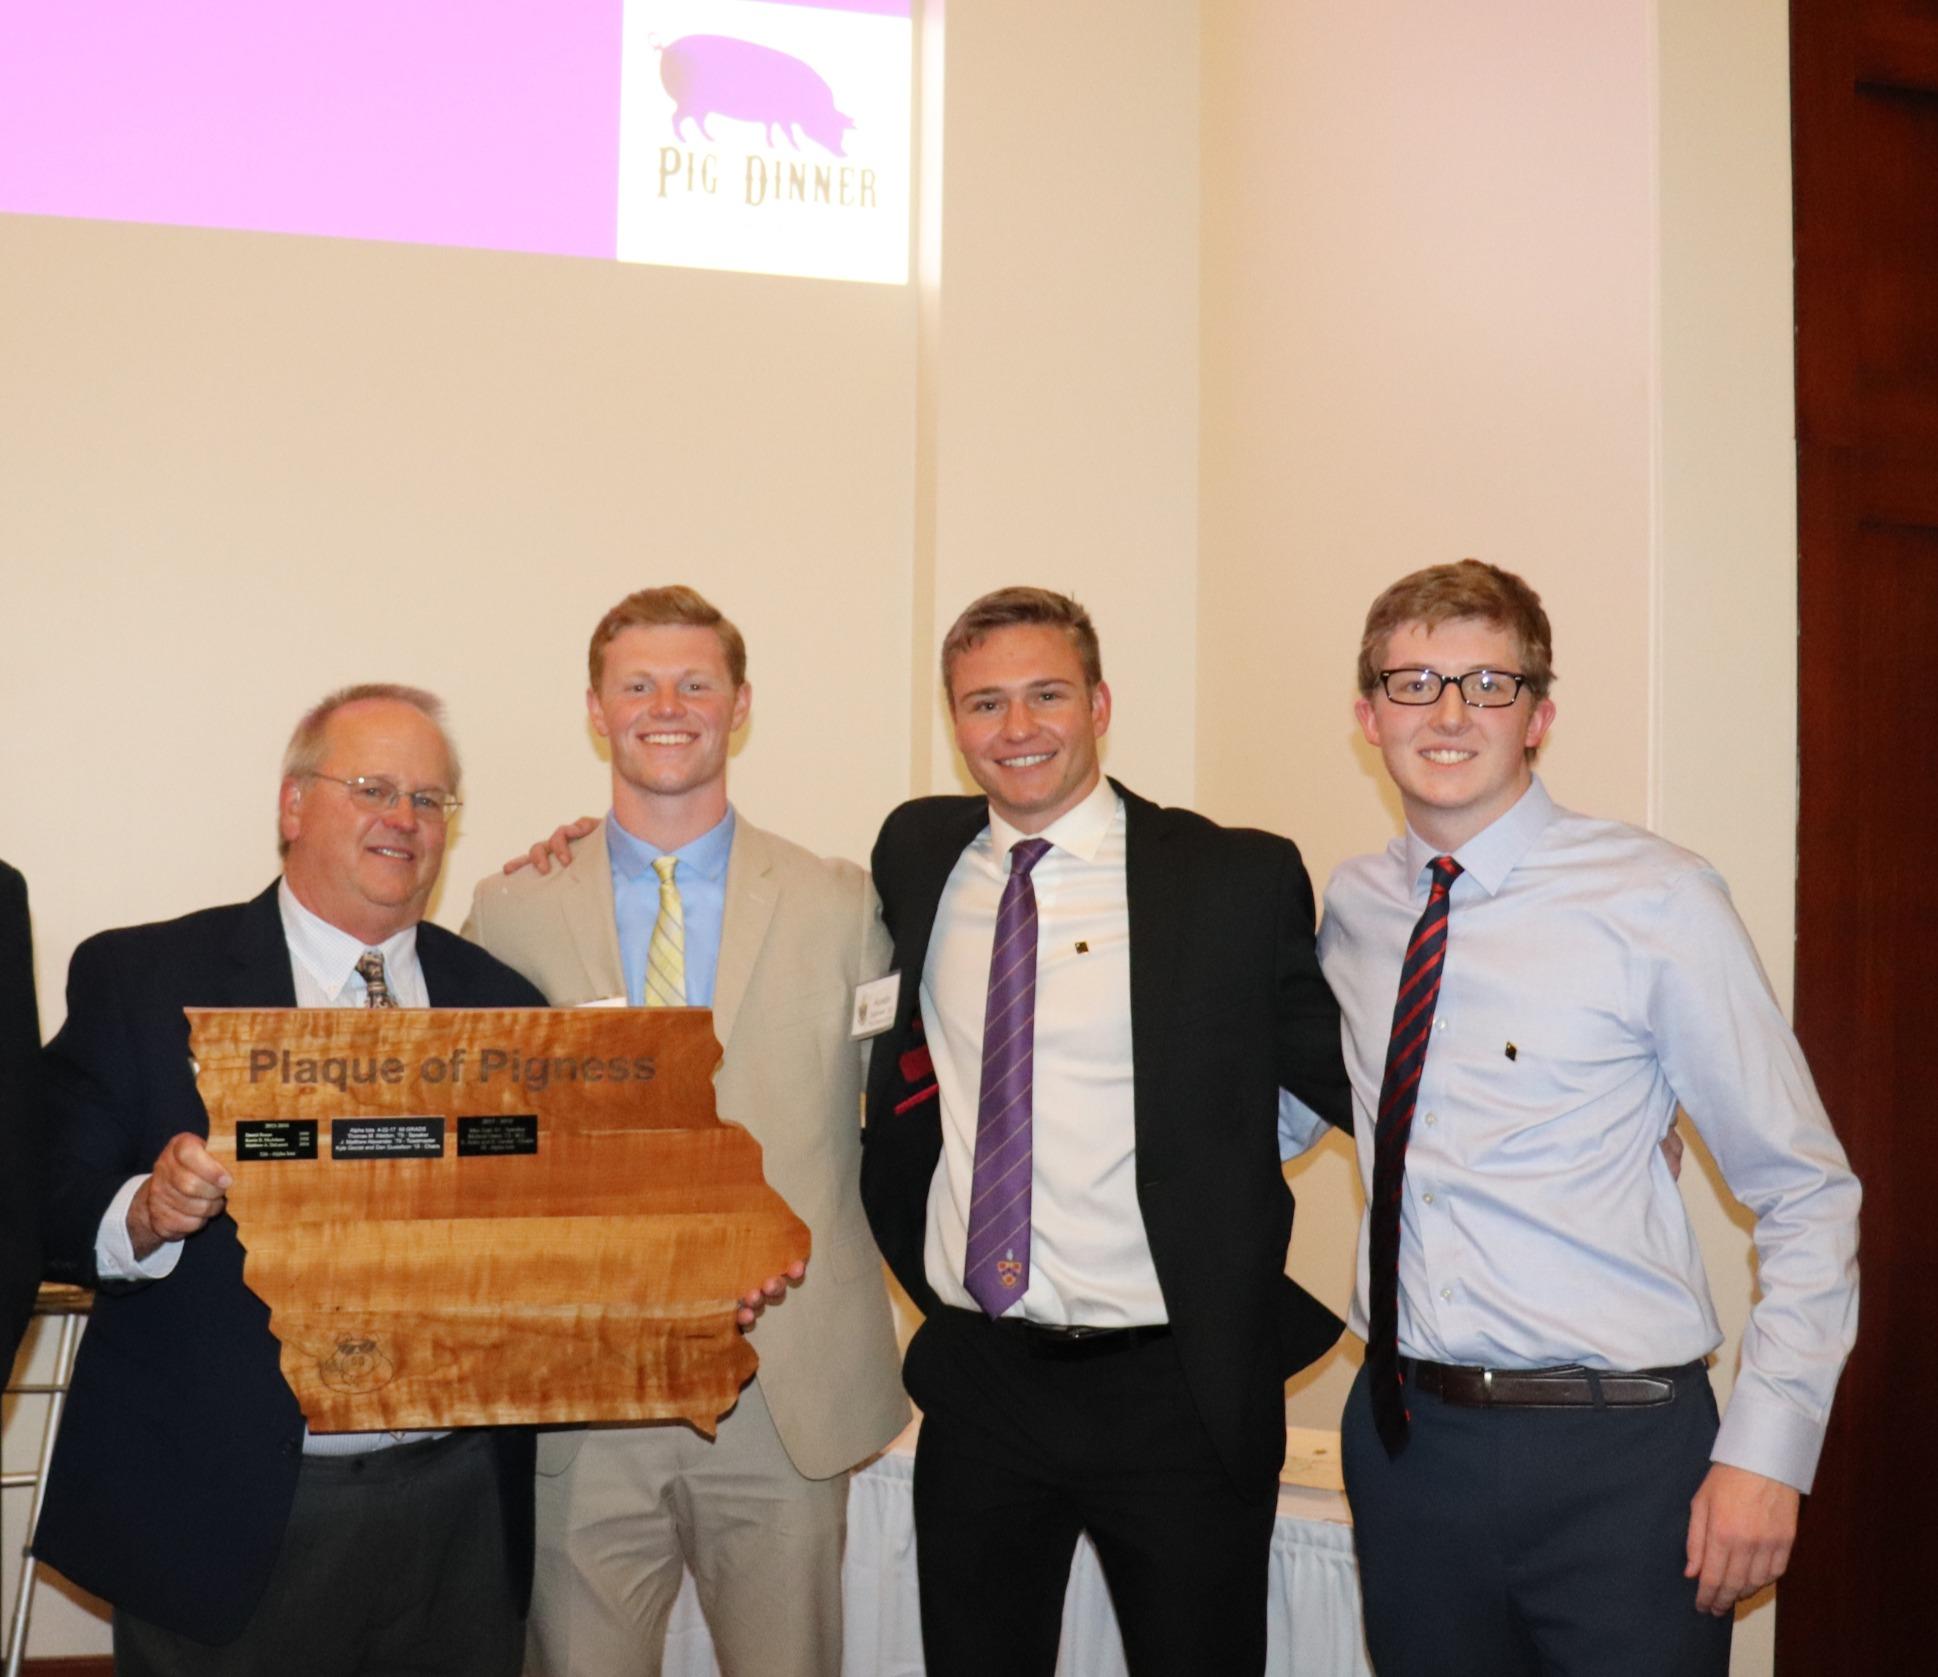 Pig Dinner Awards